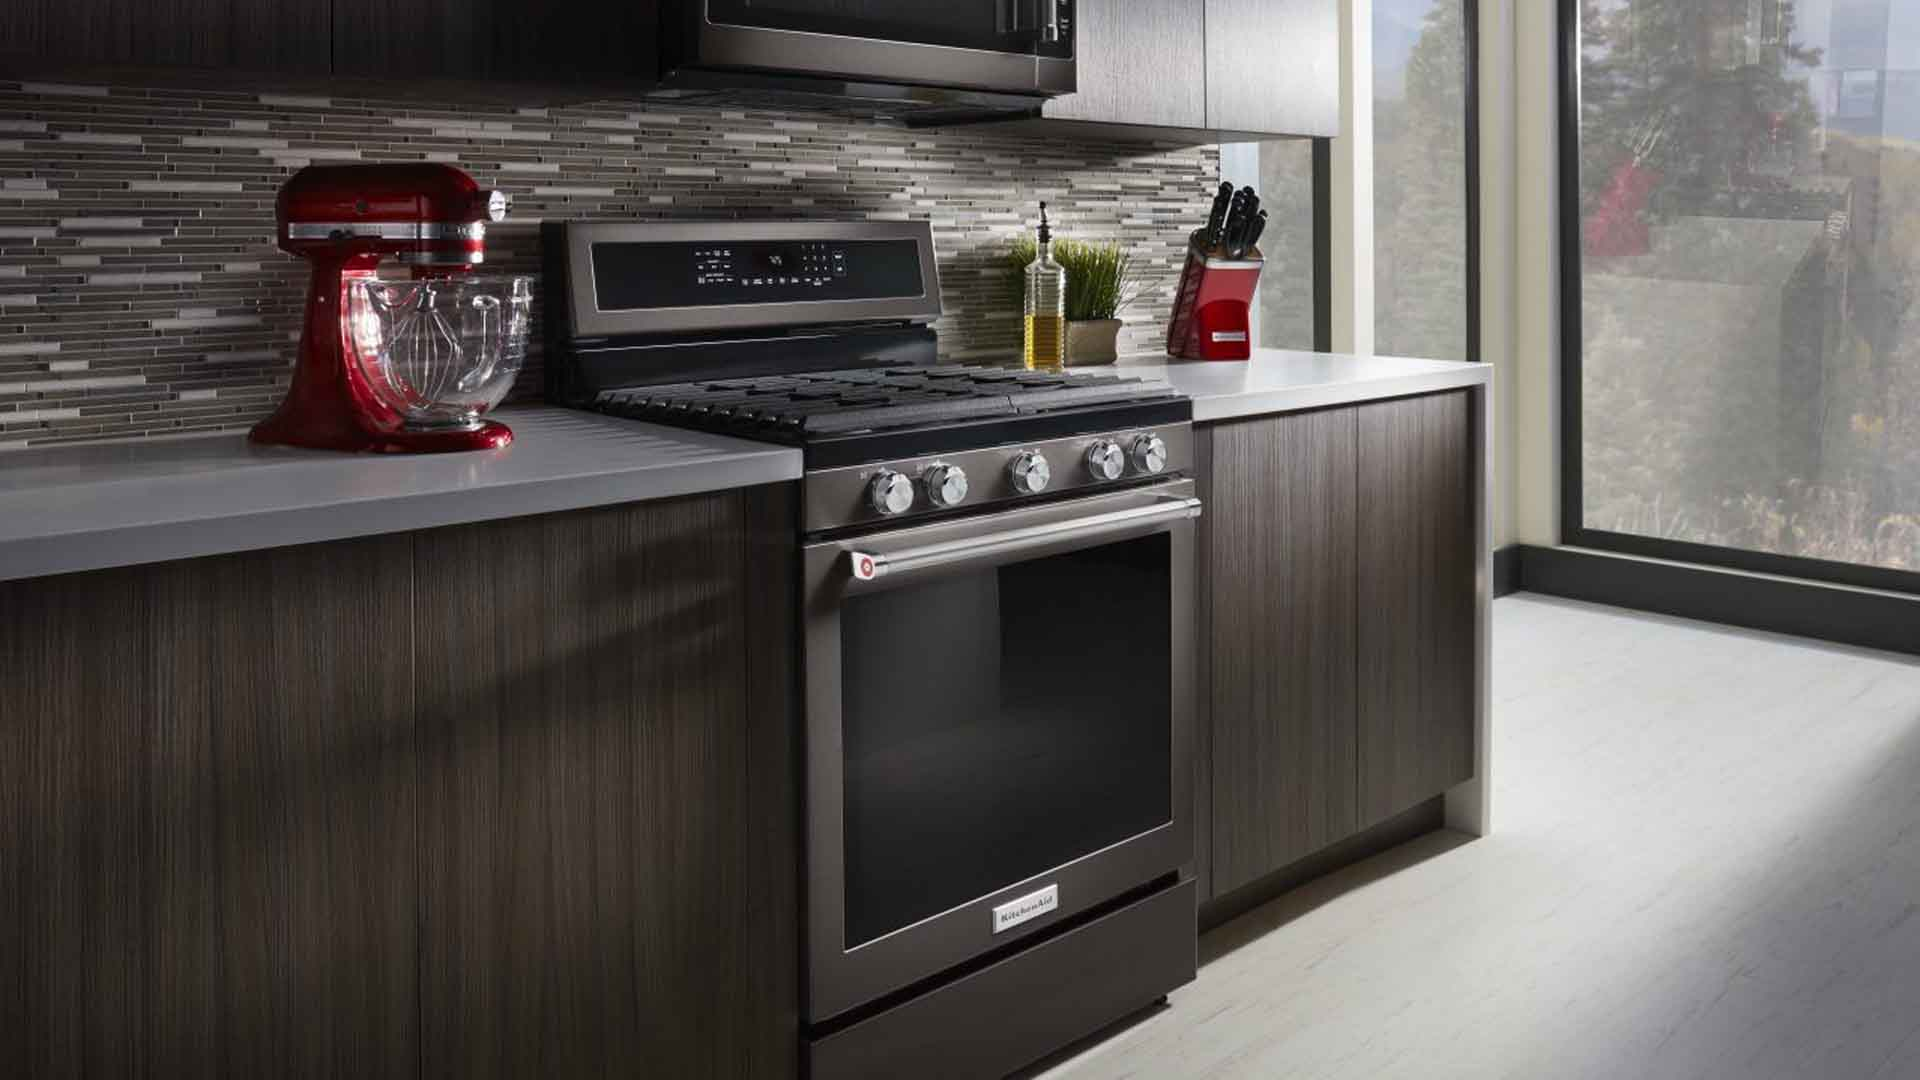 KitchenAid Freestanding Range Repair Service | Star KitchenAid Repair